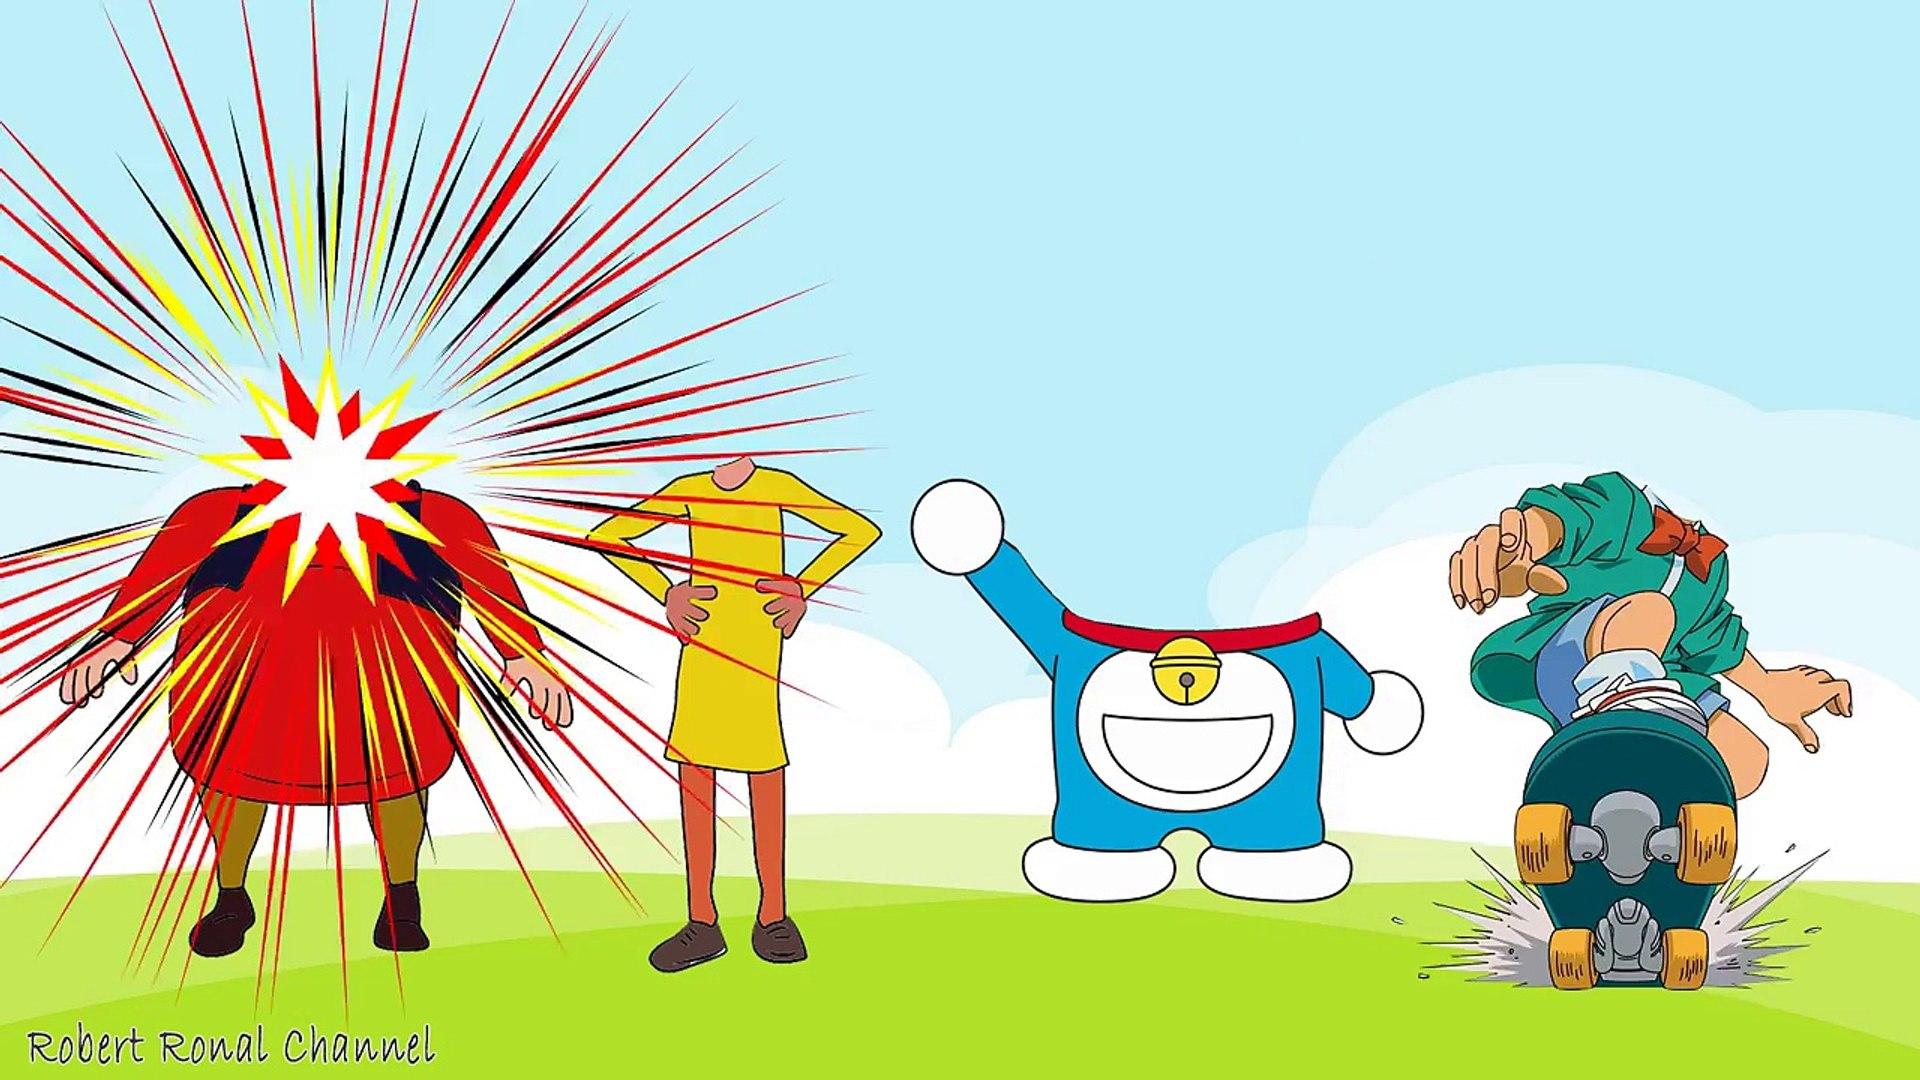 Learn Colors Wrong Heads Conan trolls Motu Patlu vs Doraemon